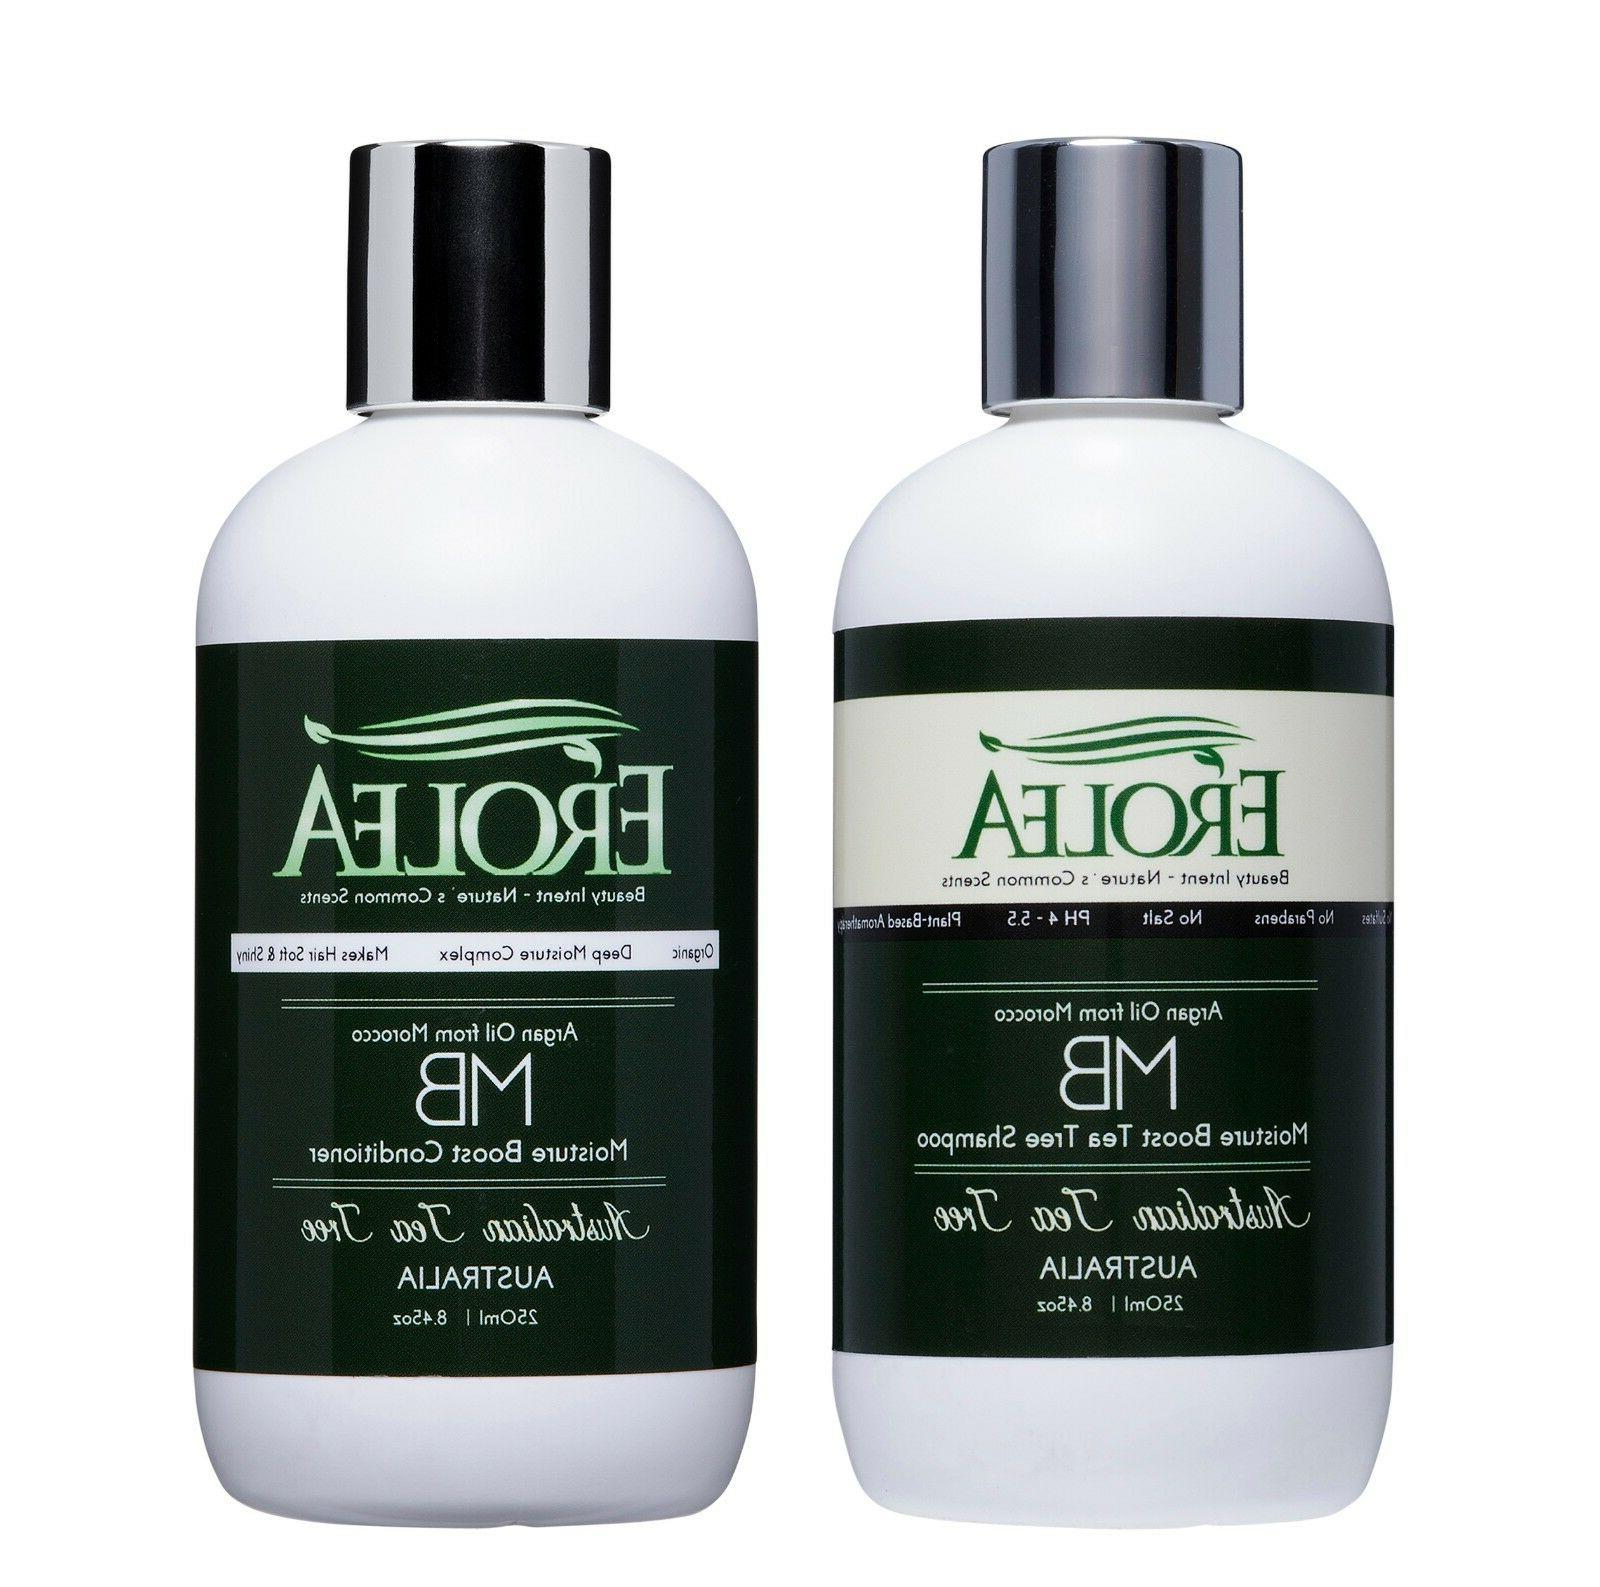 tea tree oil shampoo and conditioner 8